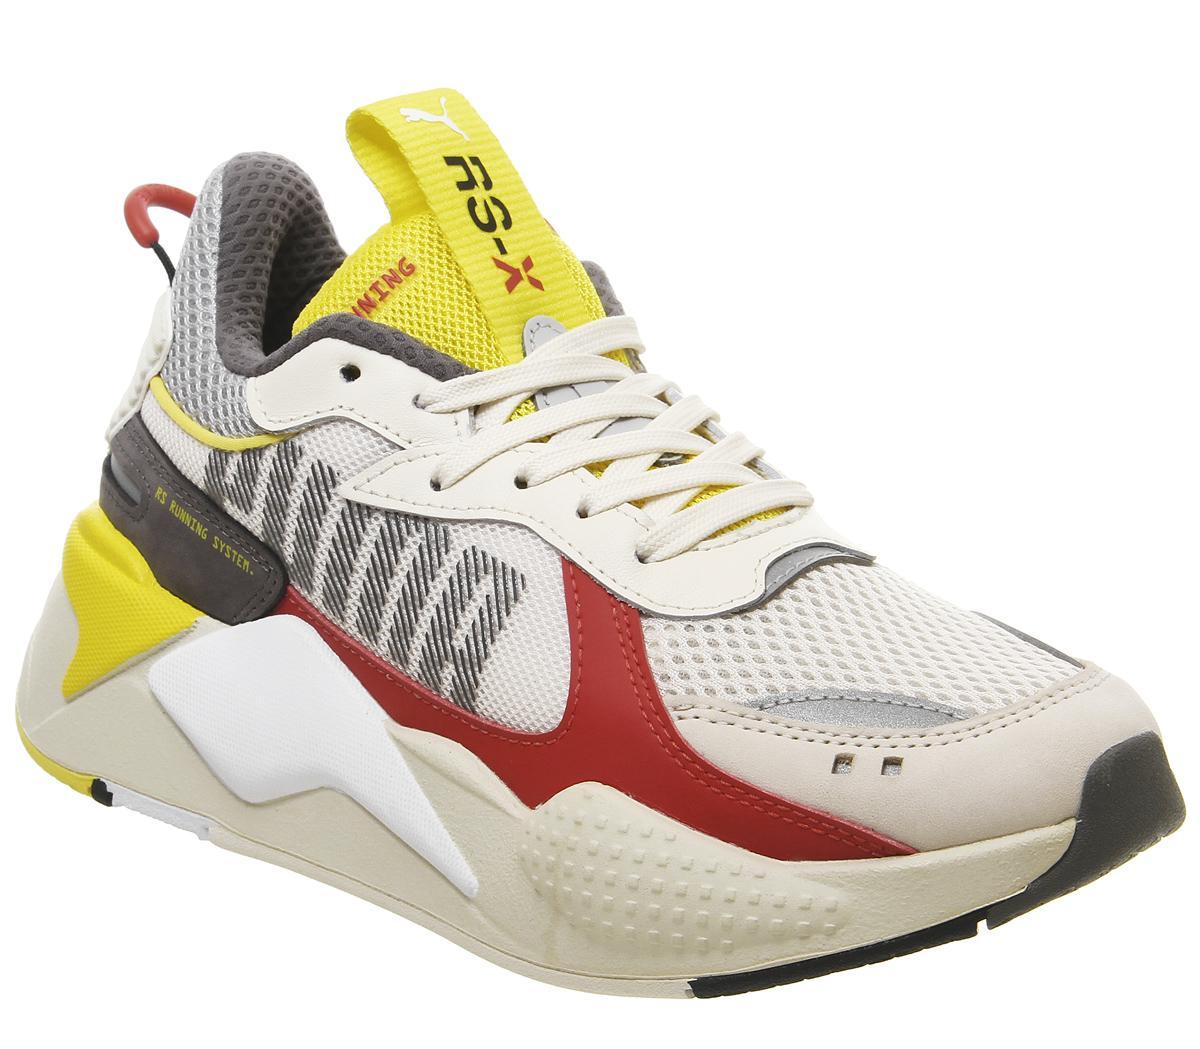 Puma Rs-x Bold Trainers Whisper White High Rise Red Blazing ...